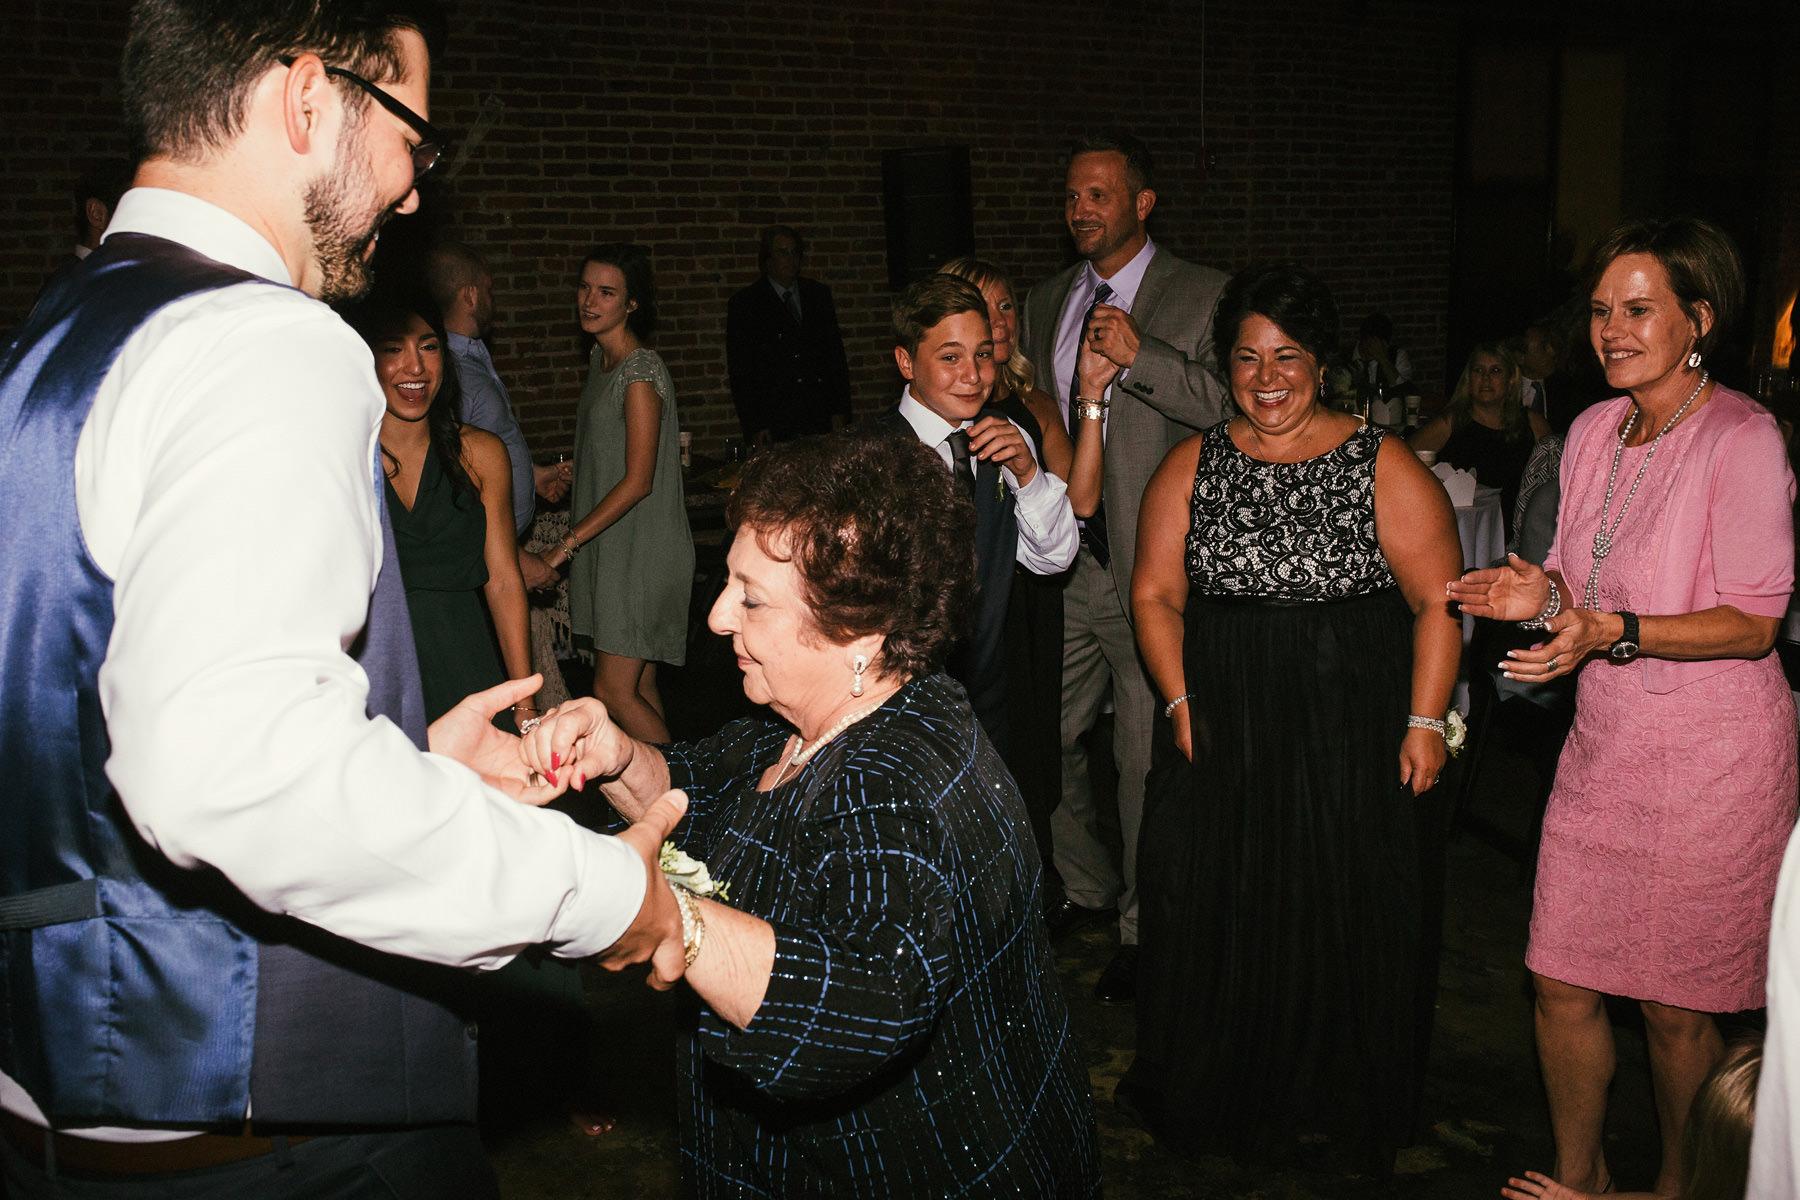 Kansas City Summer Wedding at the Guild_Kindling Wedding Photography Blog86.JPG